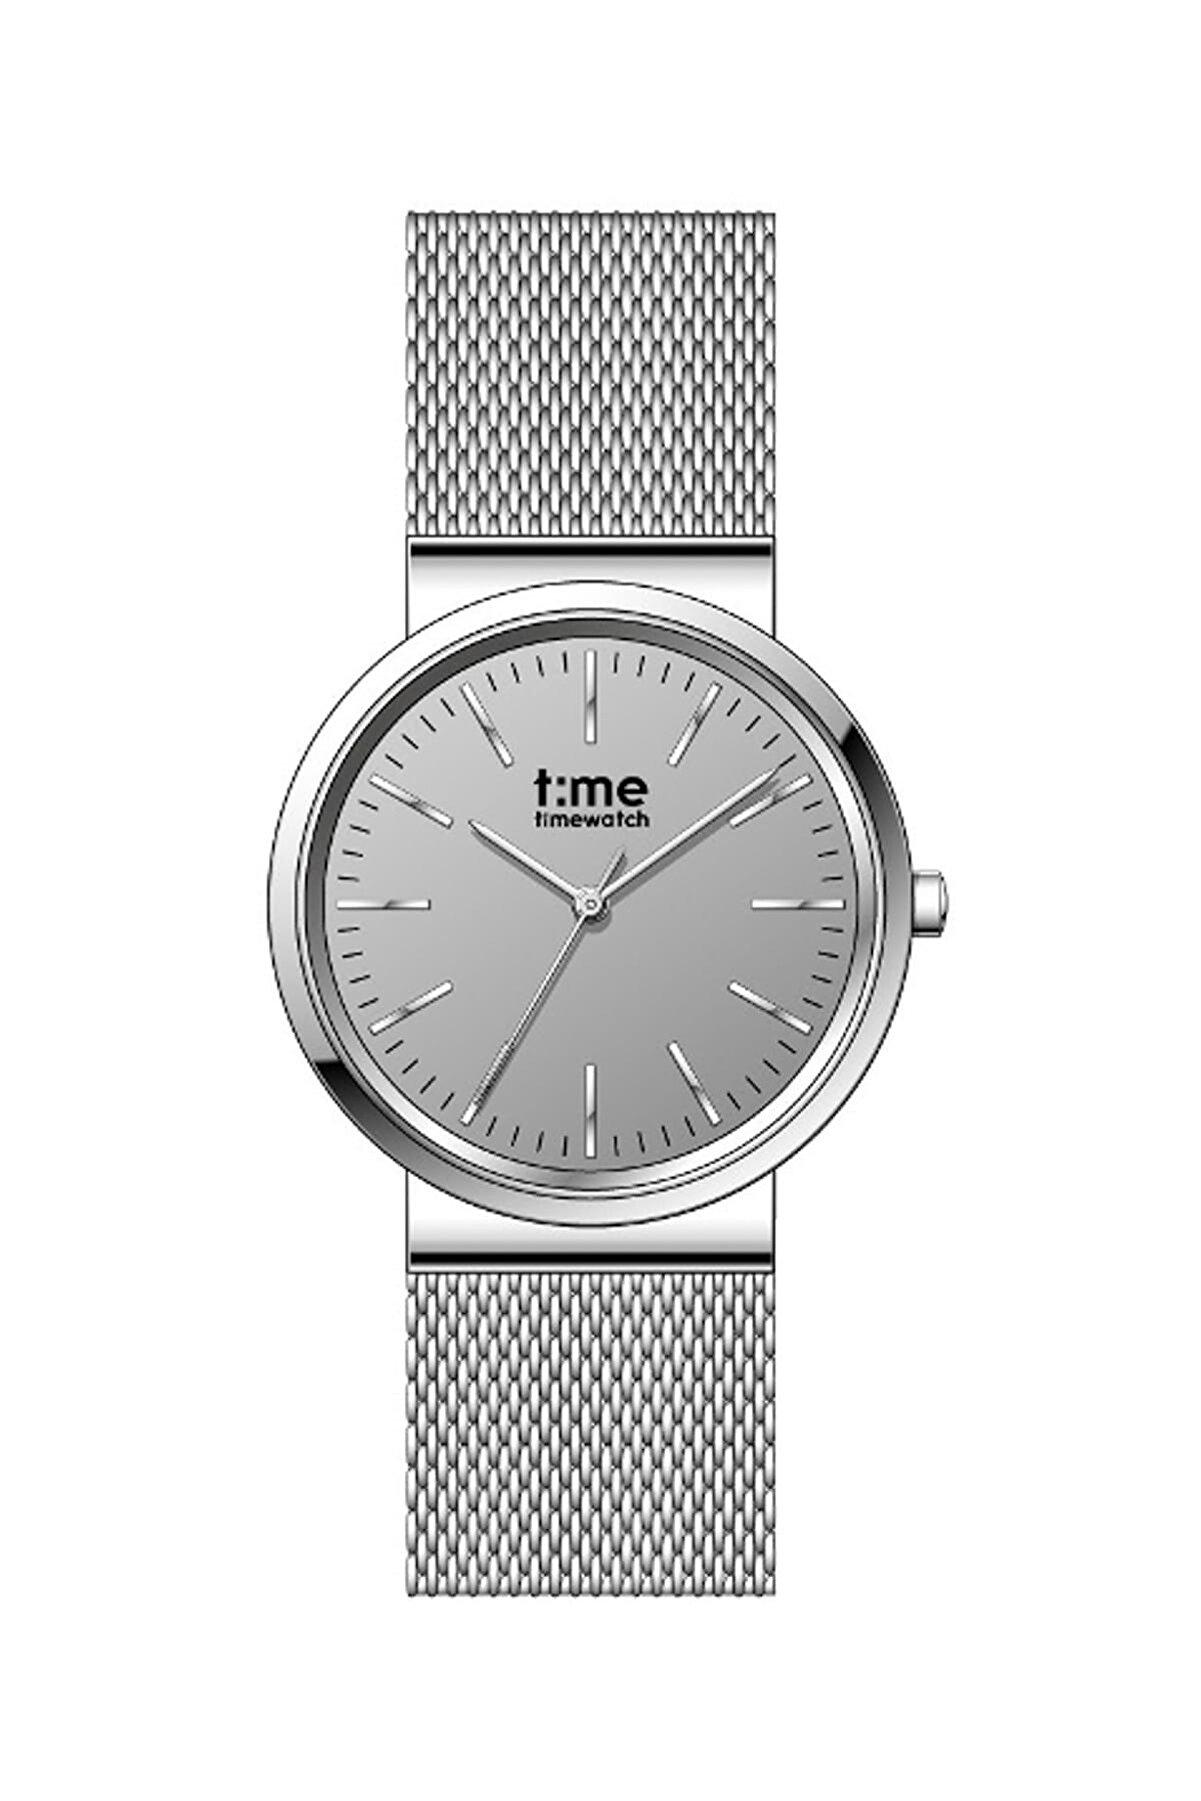 Timewatch Kadın Kol Saati TW.128.4CSC